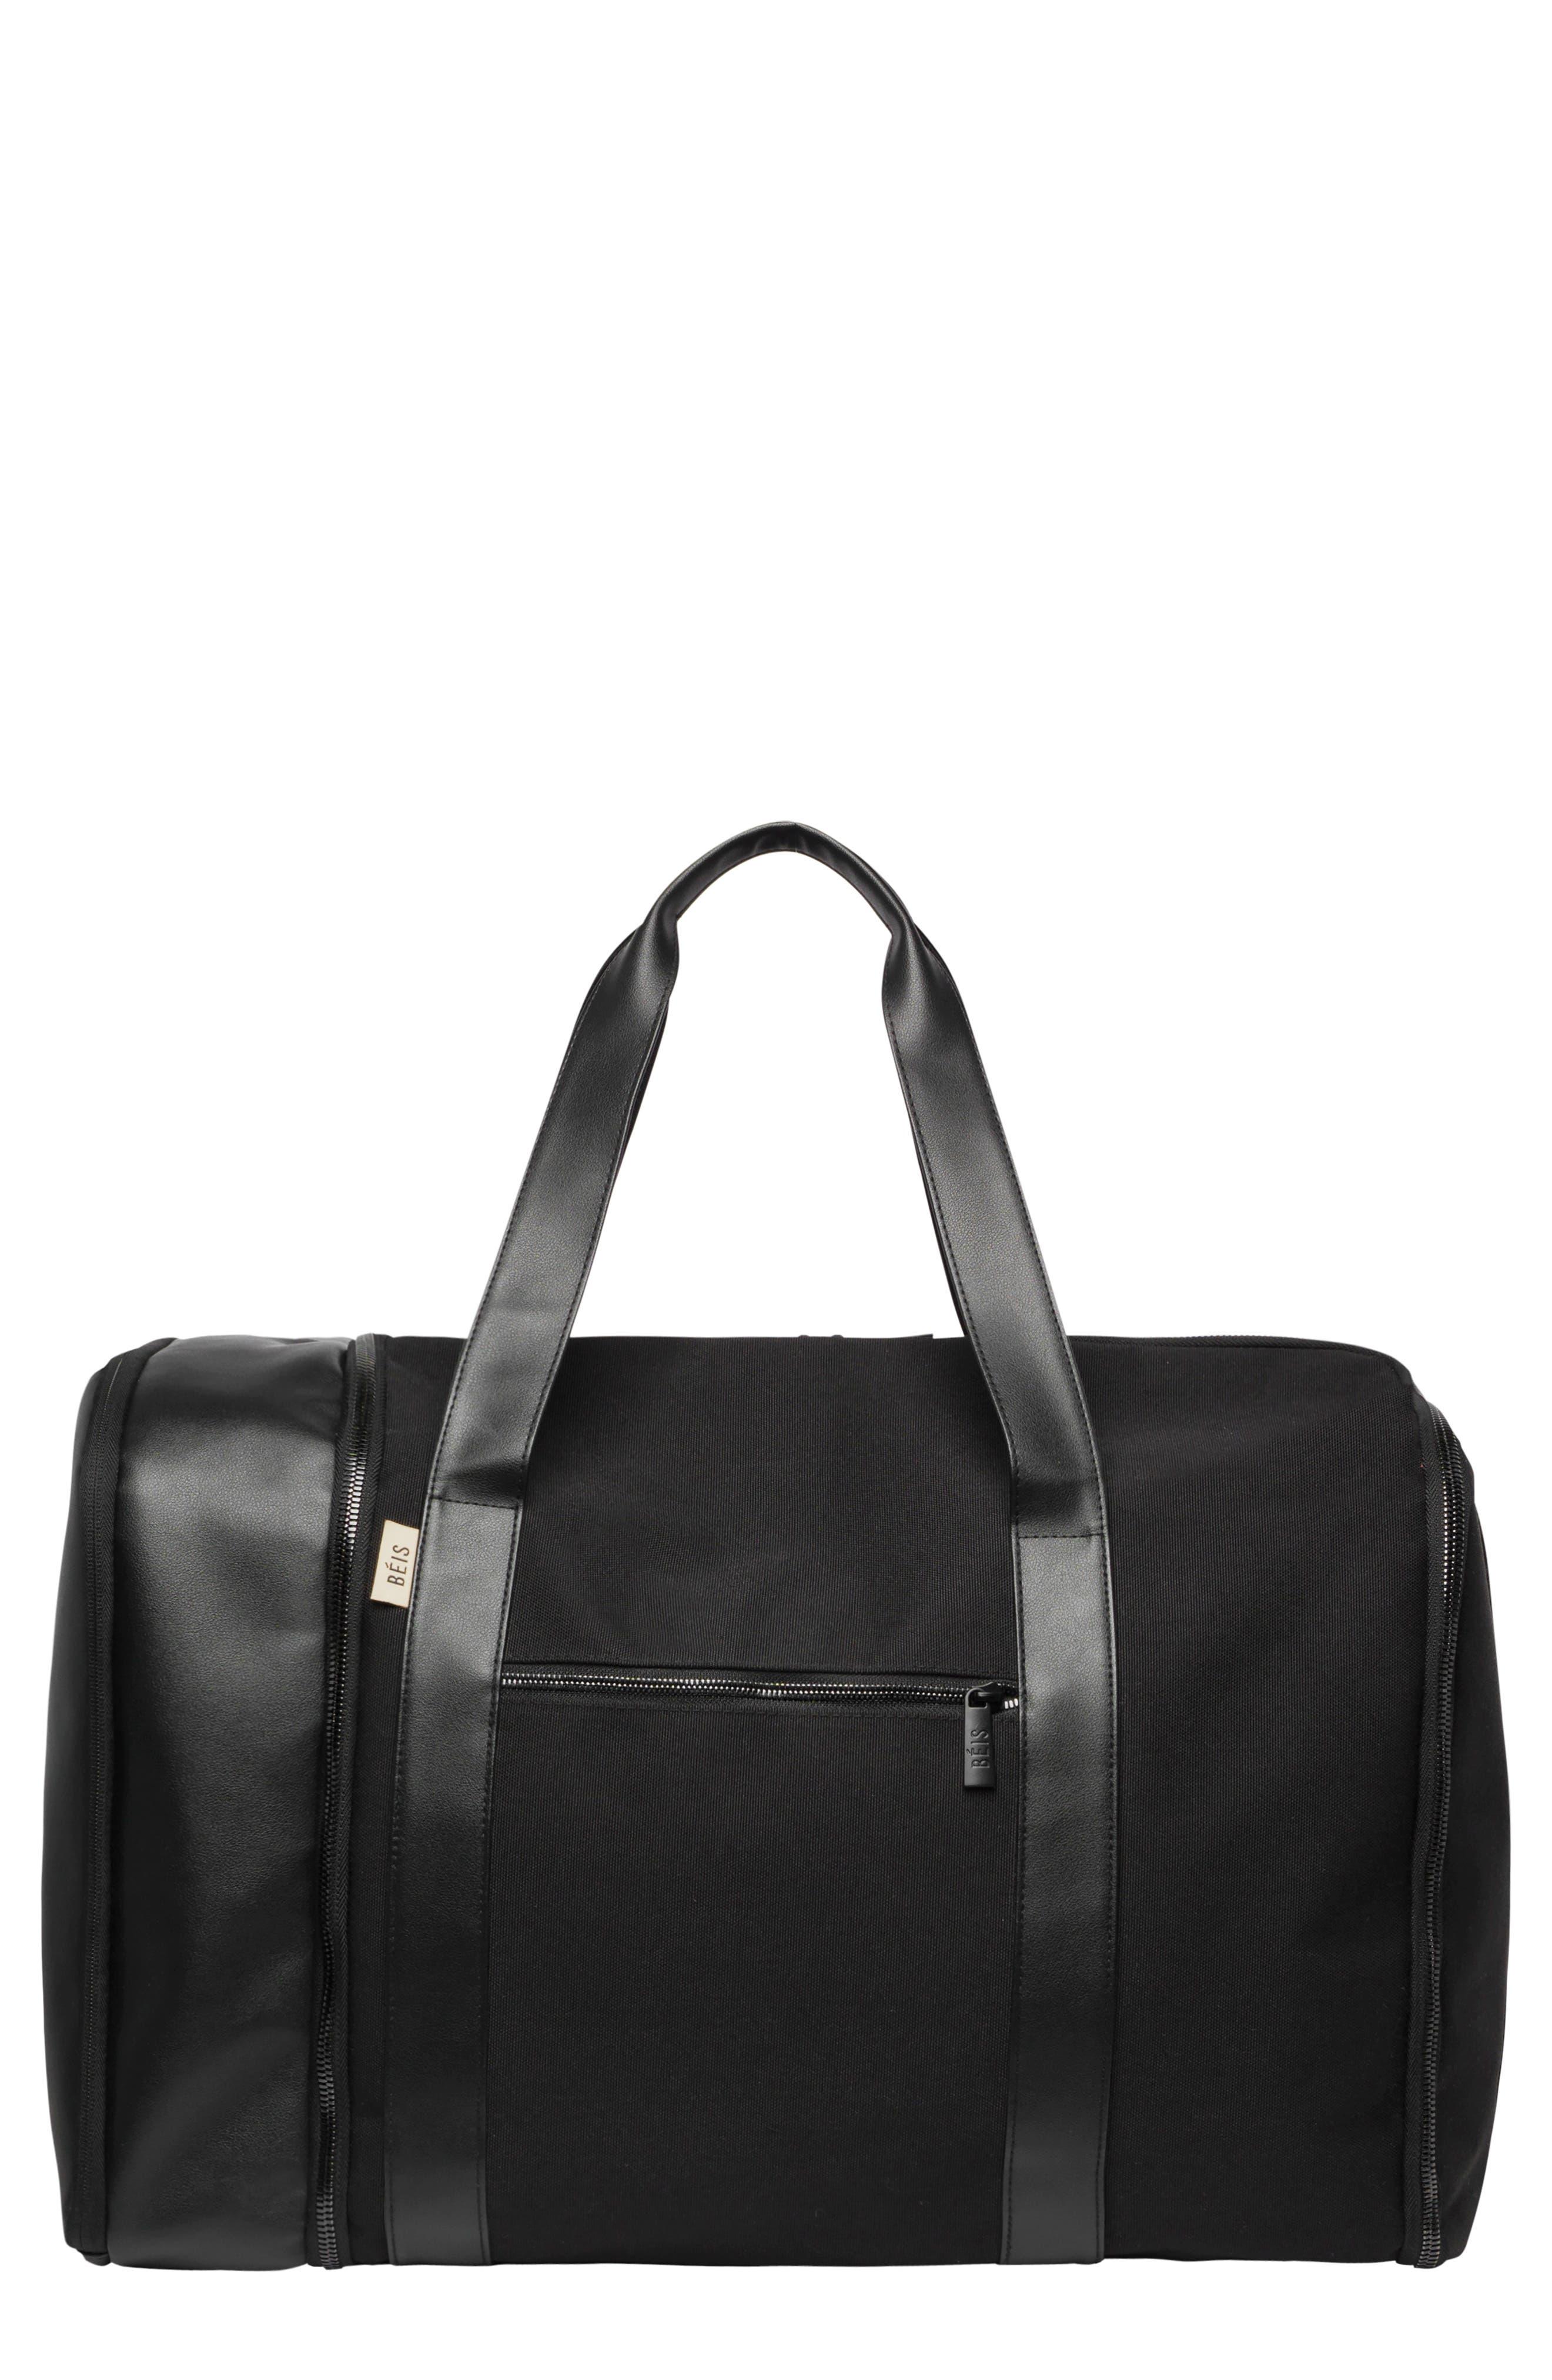 BÉIS, Travel Multi Function Duffle Bag, Main thumbnail 1, color, BLACK